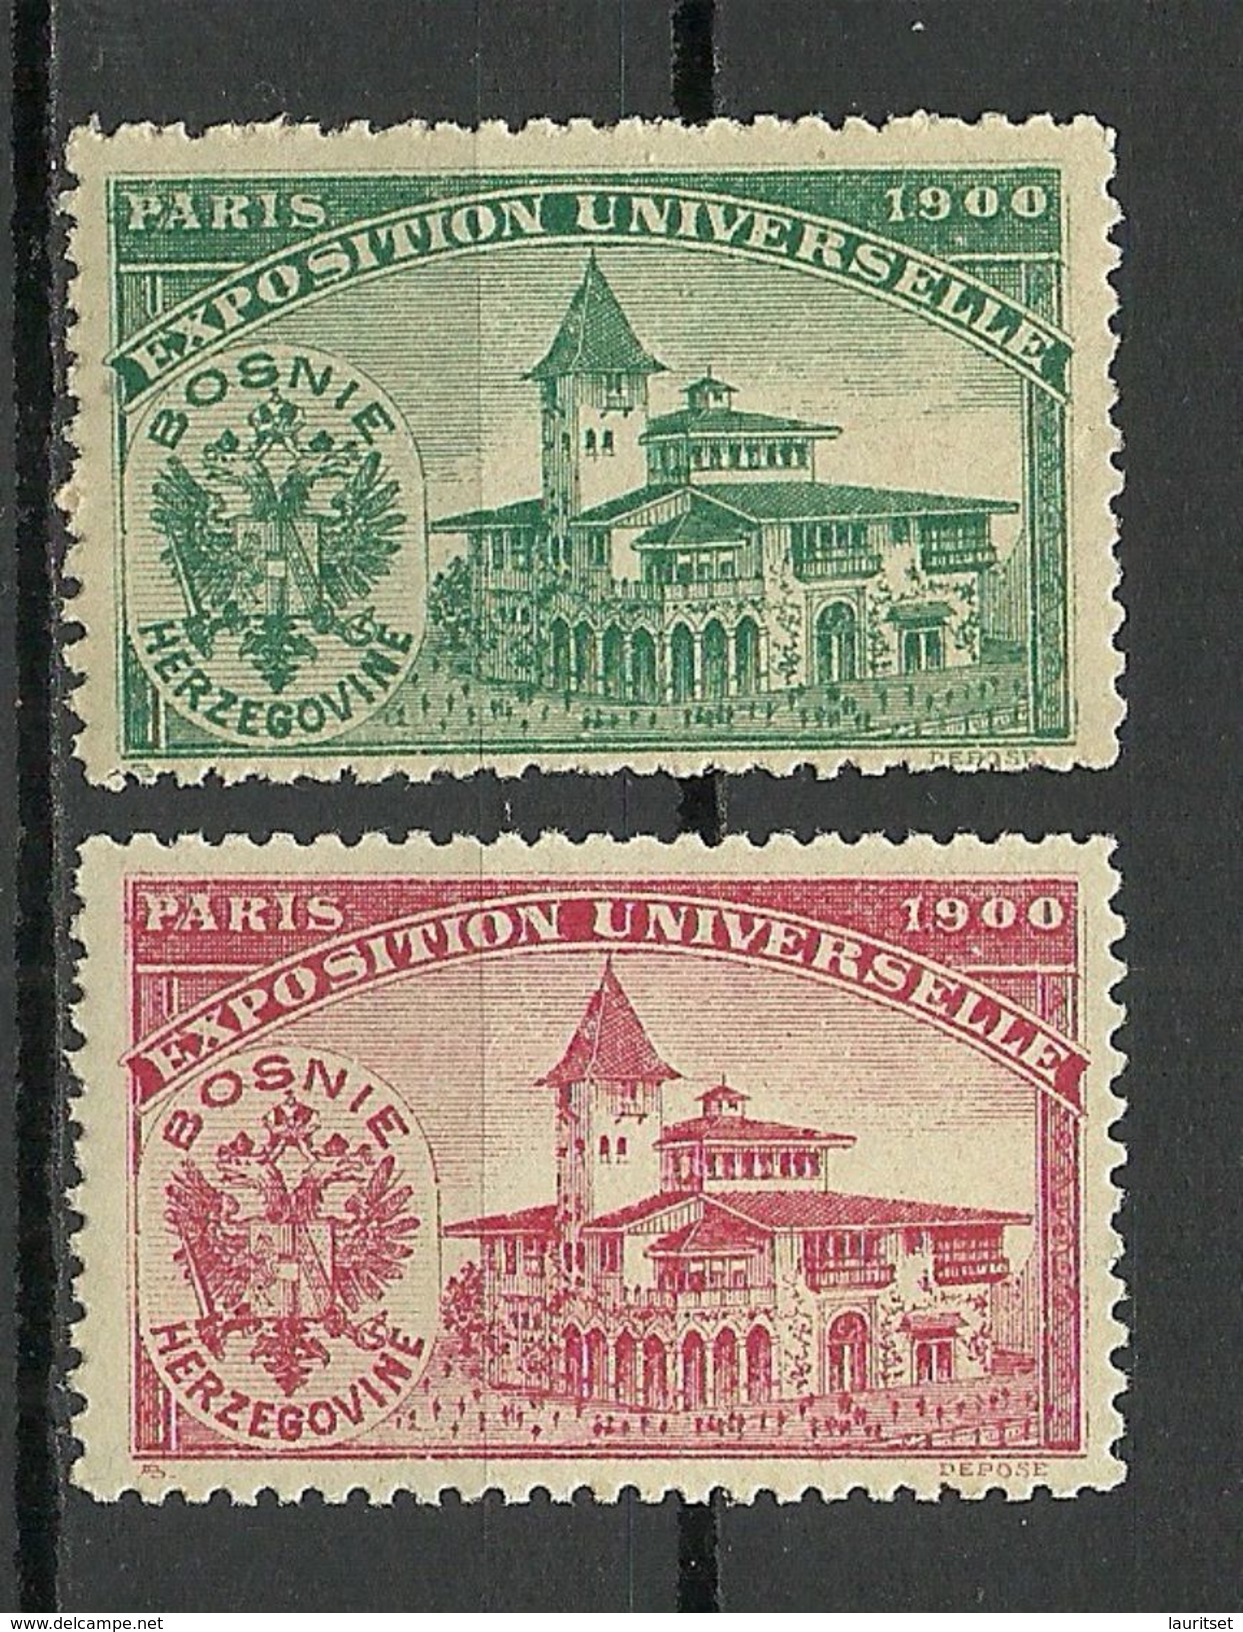 France 1900 EXPOSITION UNIVERSELLE Pavillion Bosnia Herzegovine MNH - 1900 – Paris (Frankreich)